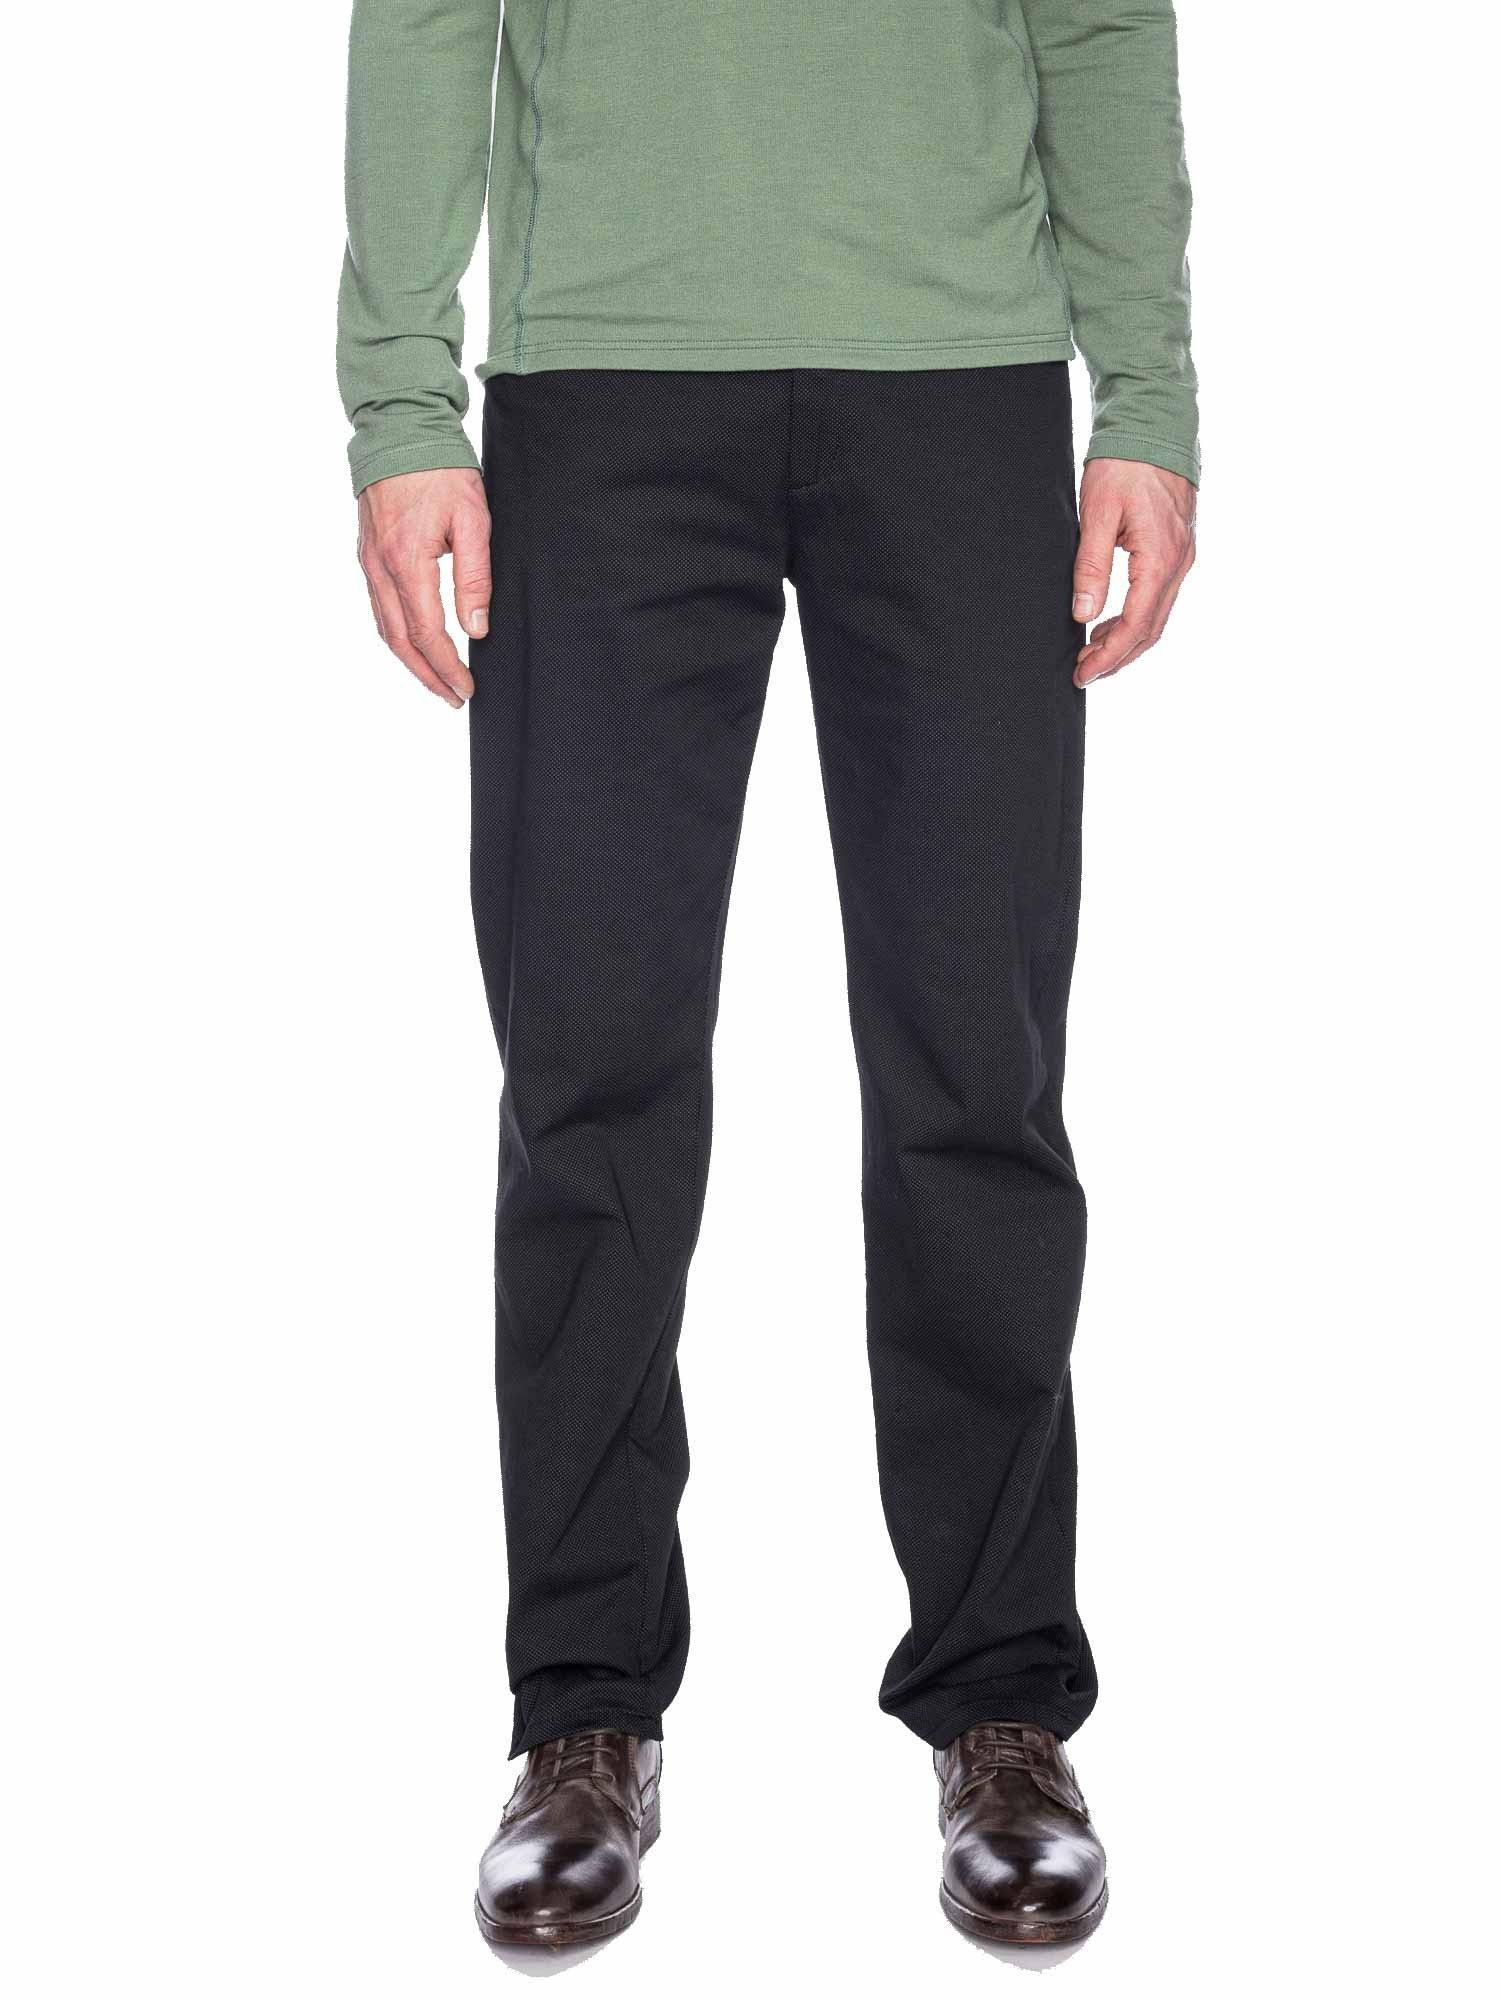 Ato Berlin - pantalon Balou zwart met fijn puntjes patroon